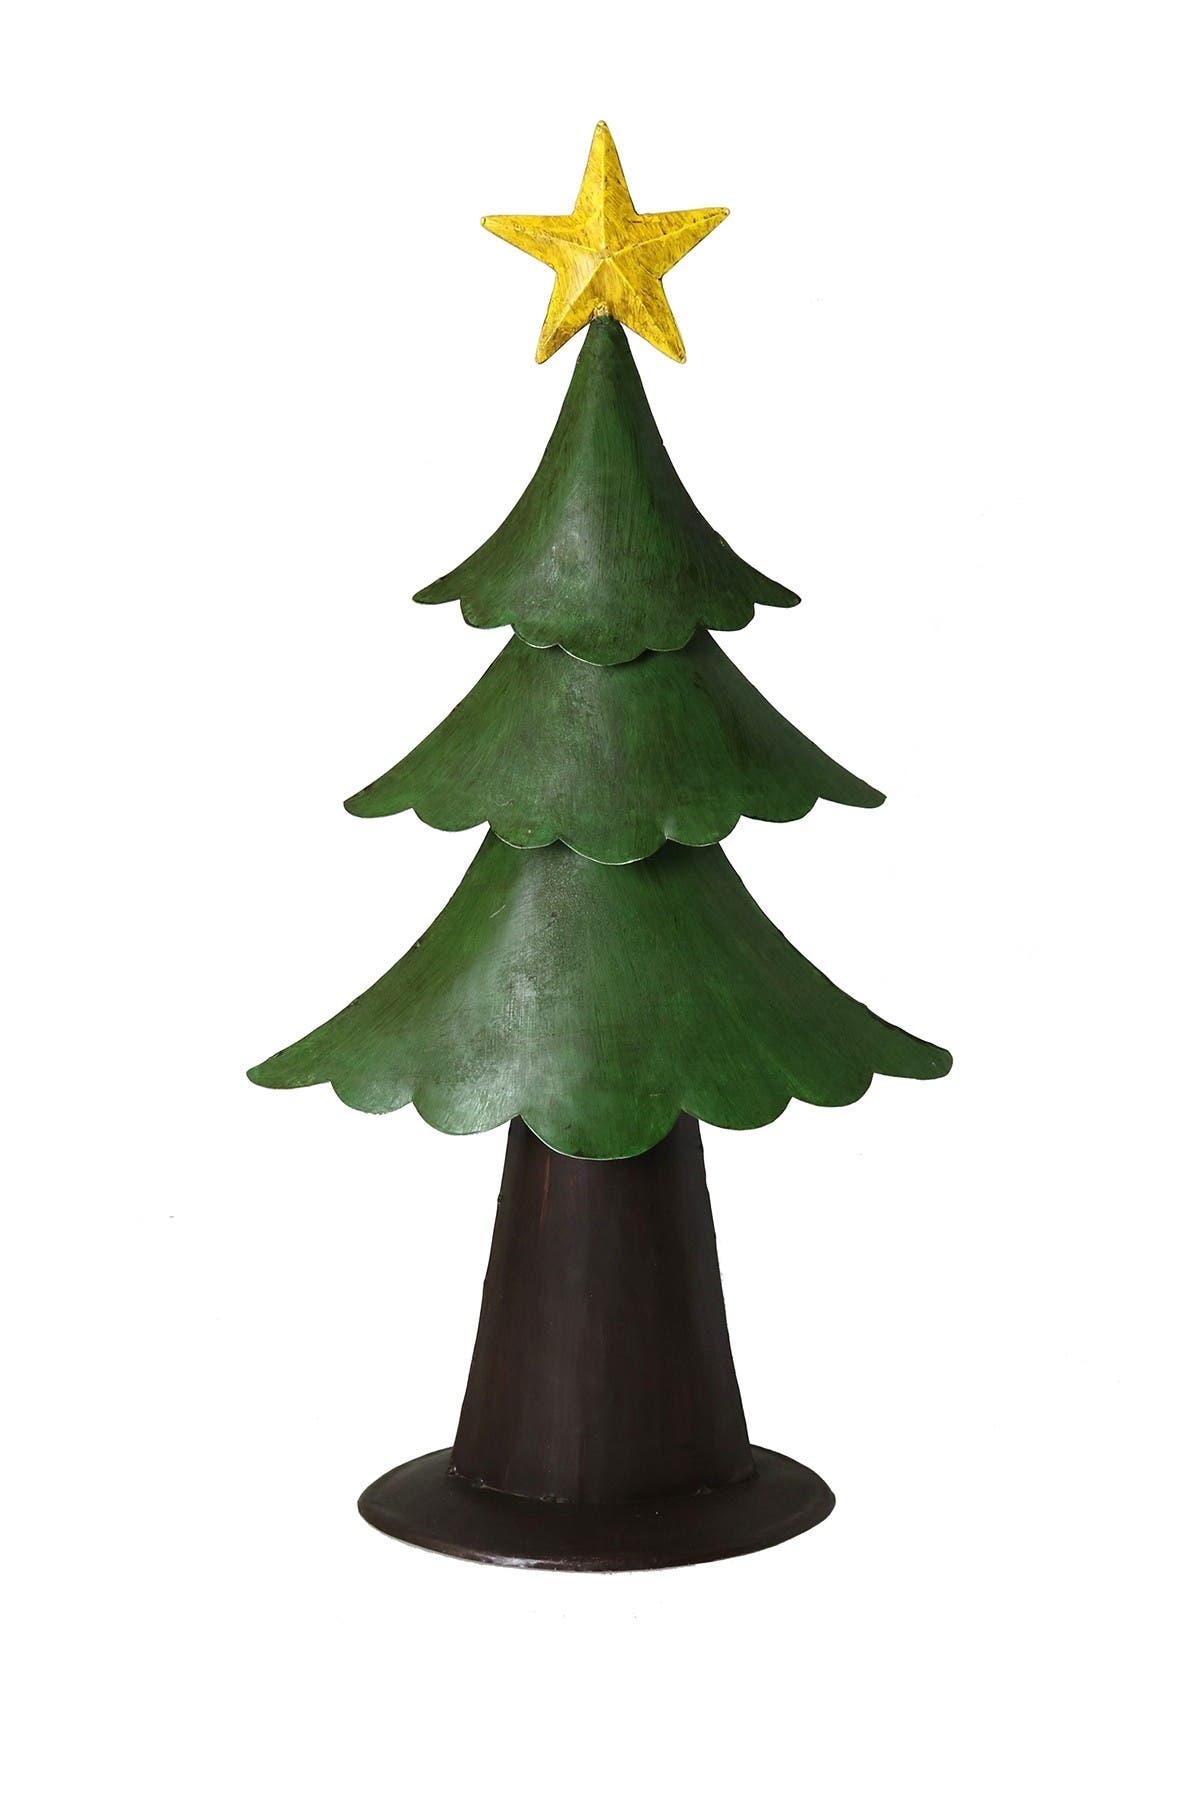 Image of HOMART Metal Christmas Tree - Large